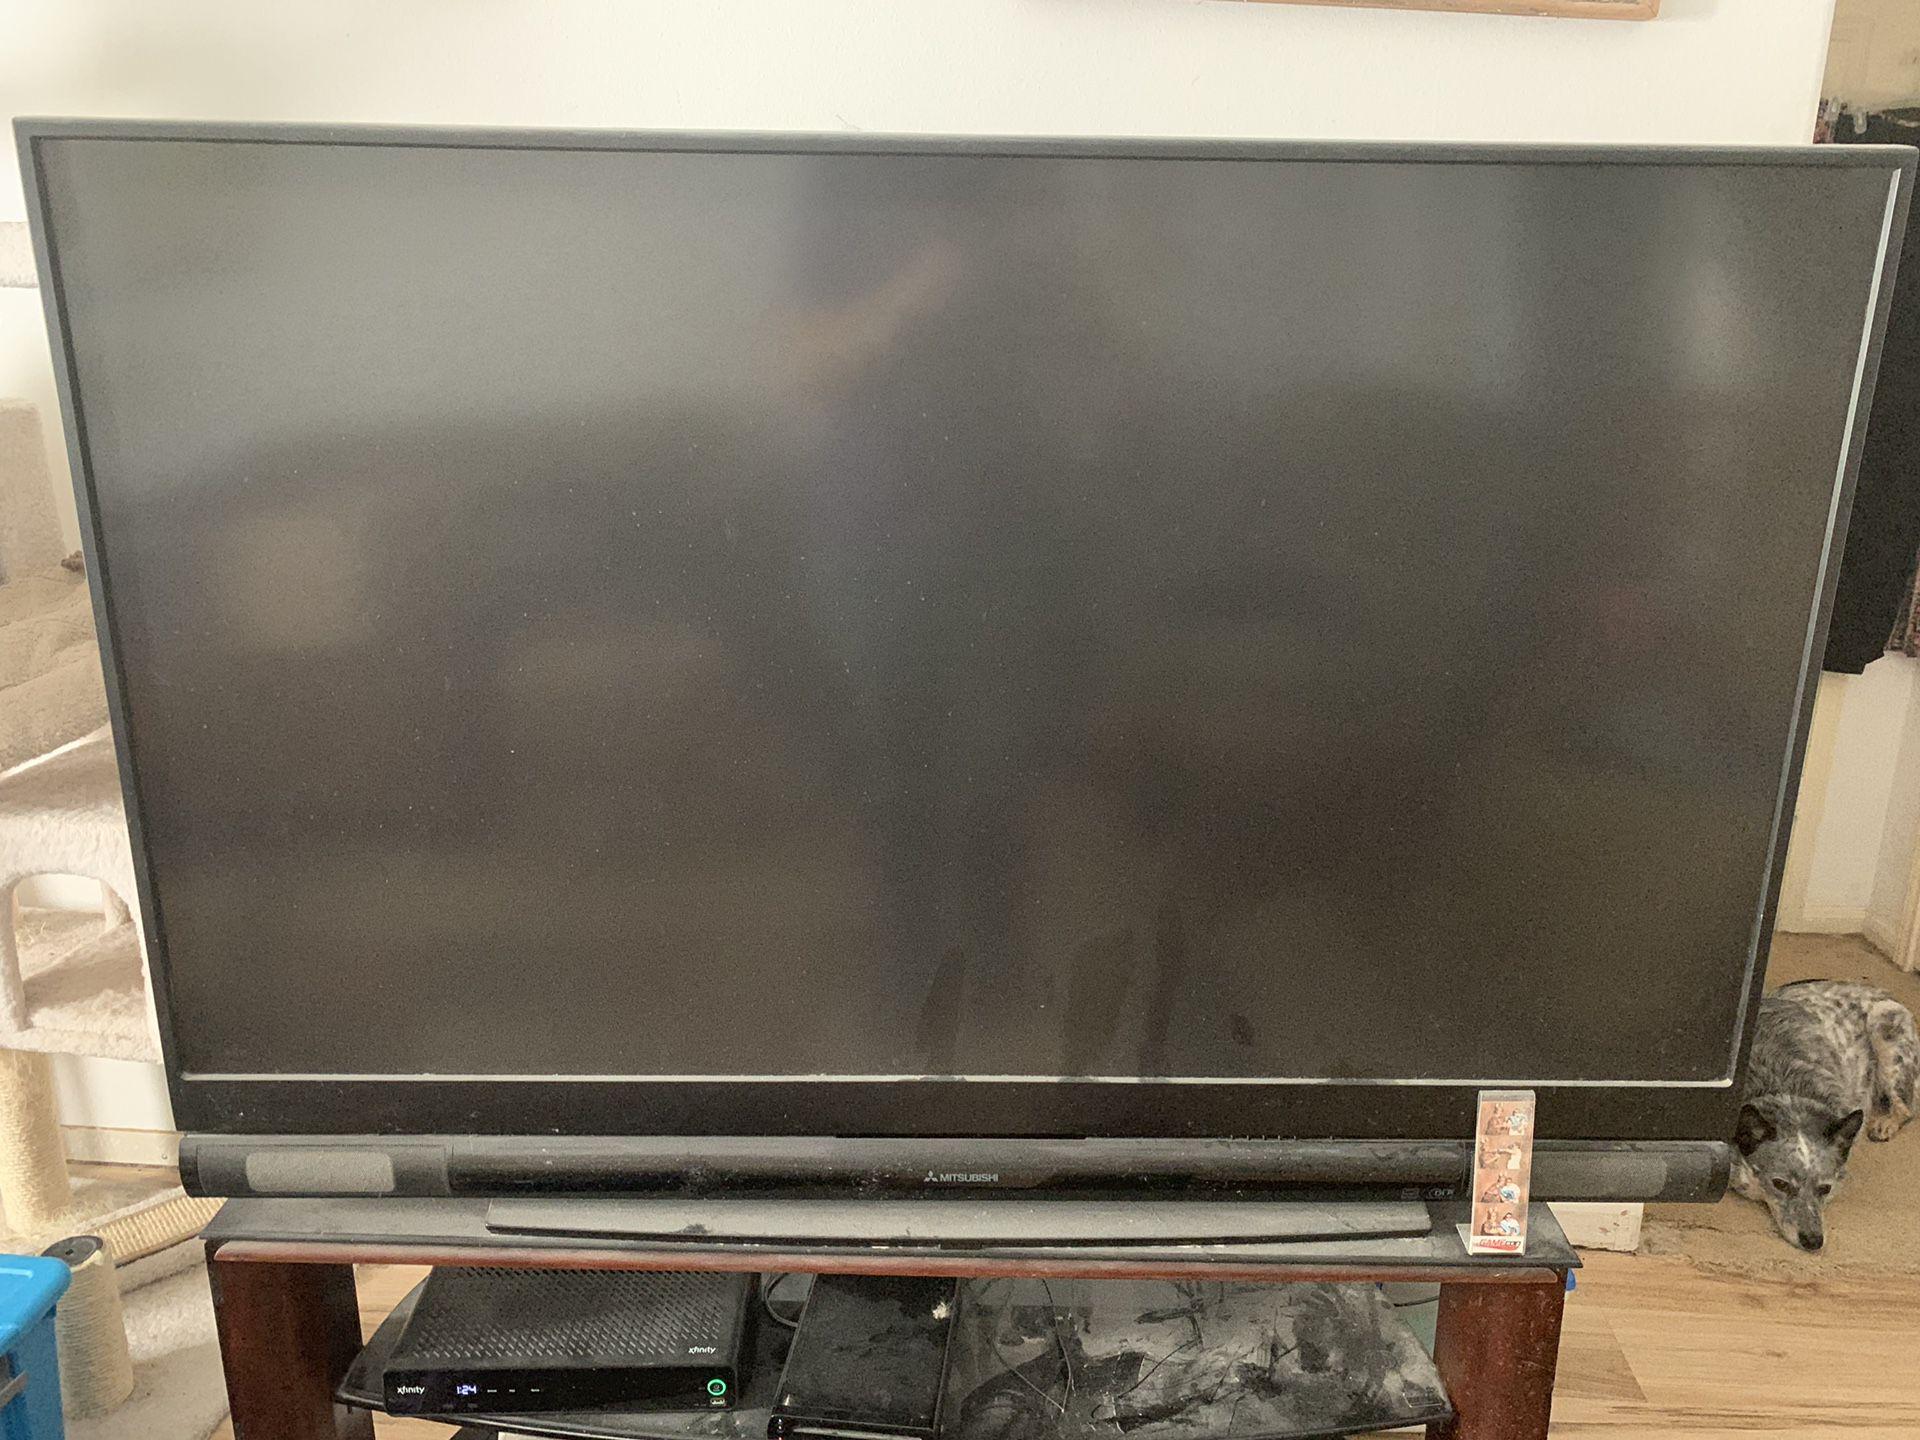 65 inch DLP Mitsubishi TV